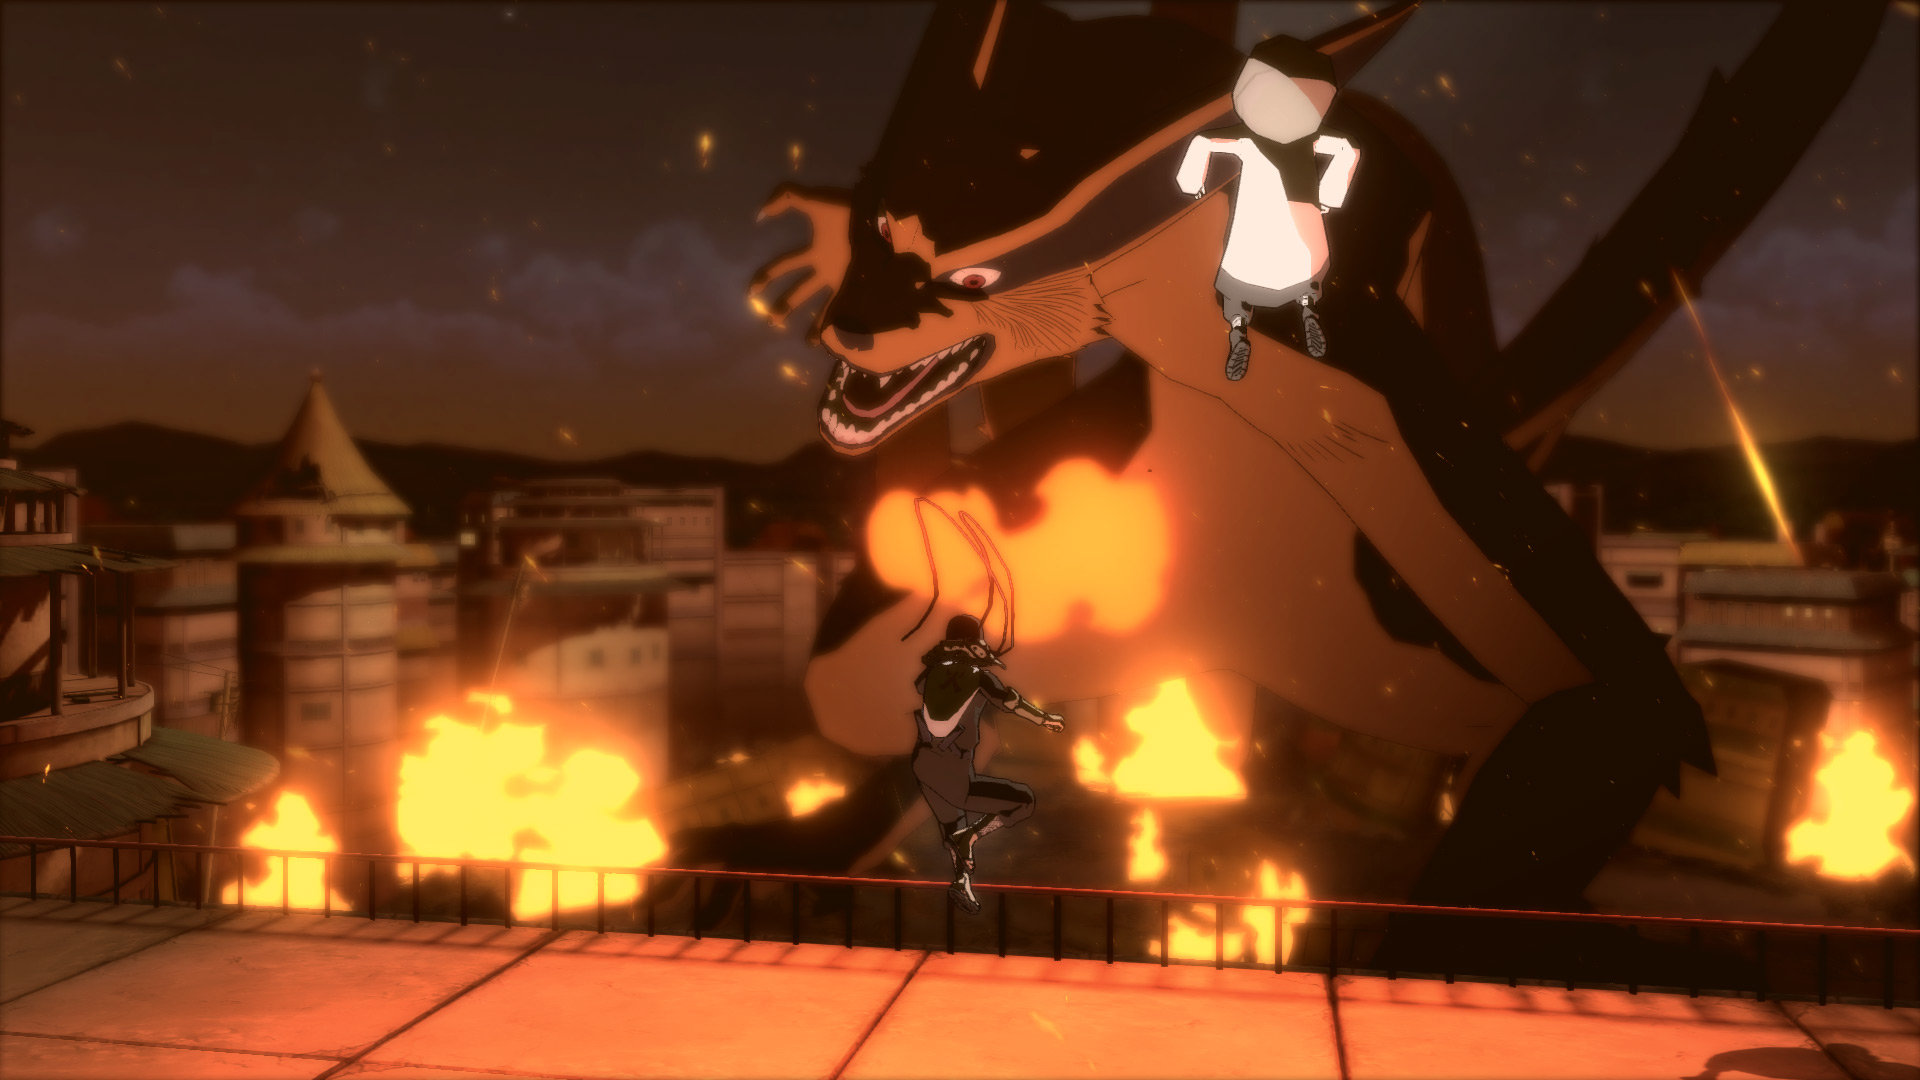 NARUTO SHIPPUDEN: Ultimate Ninja STORM 3 Full Burst Game | PS4 - PlayStation